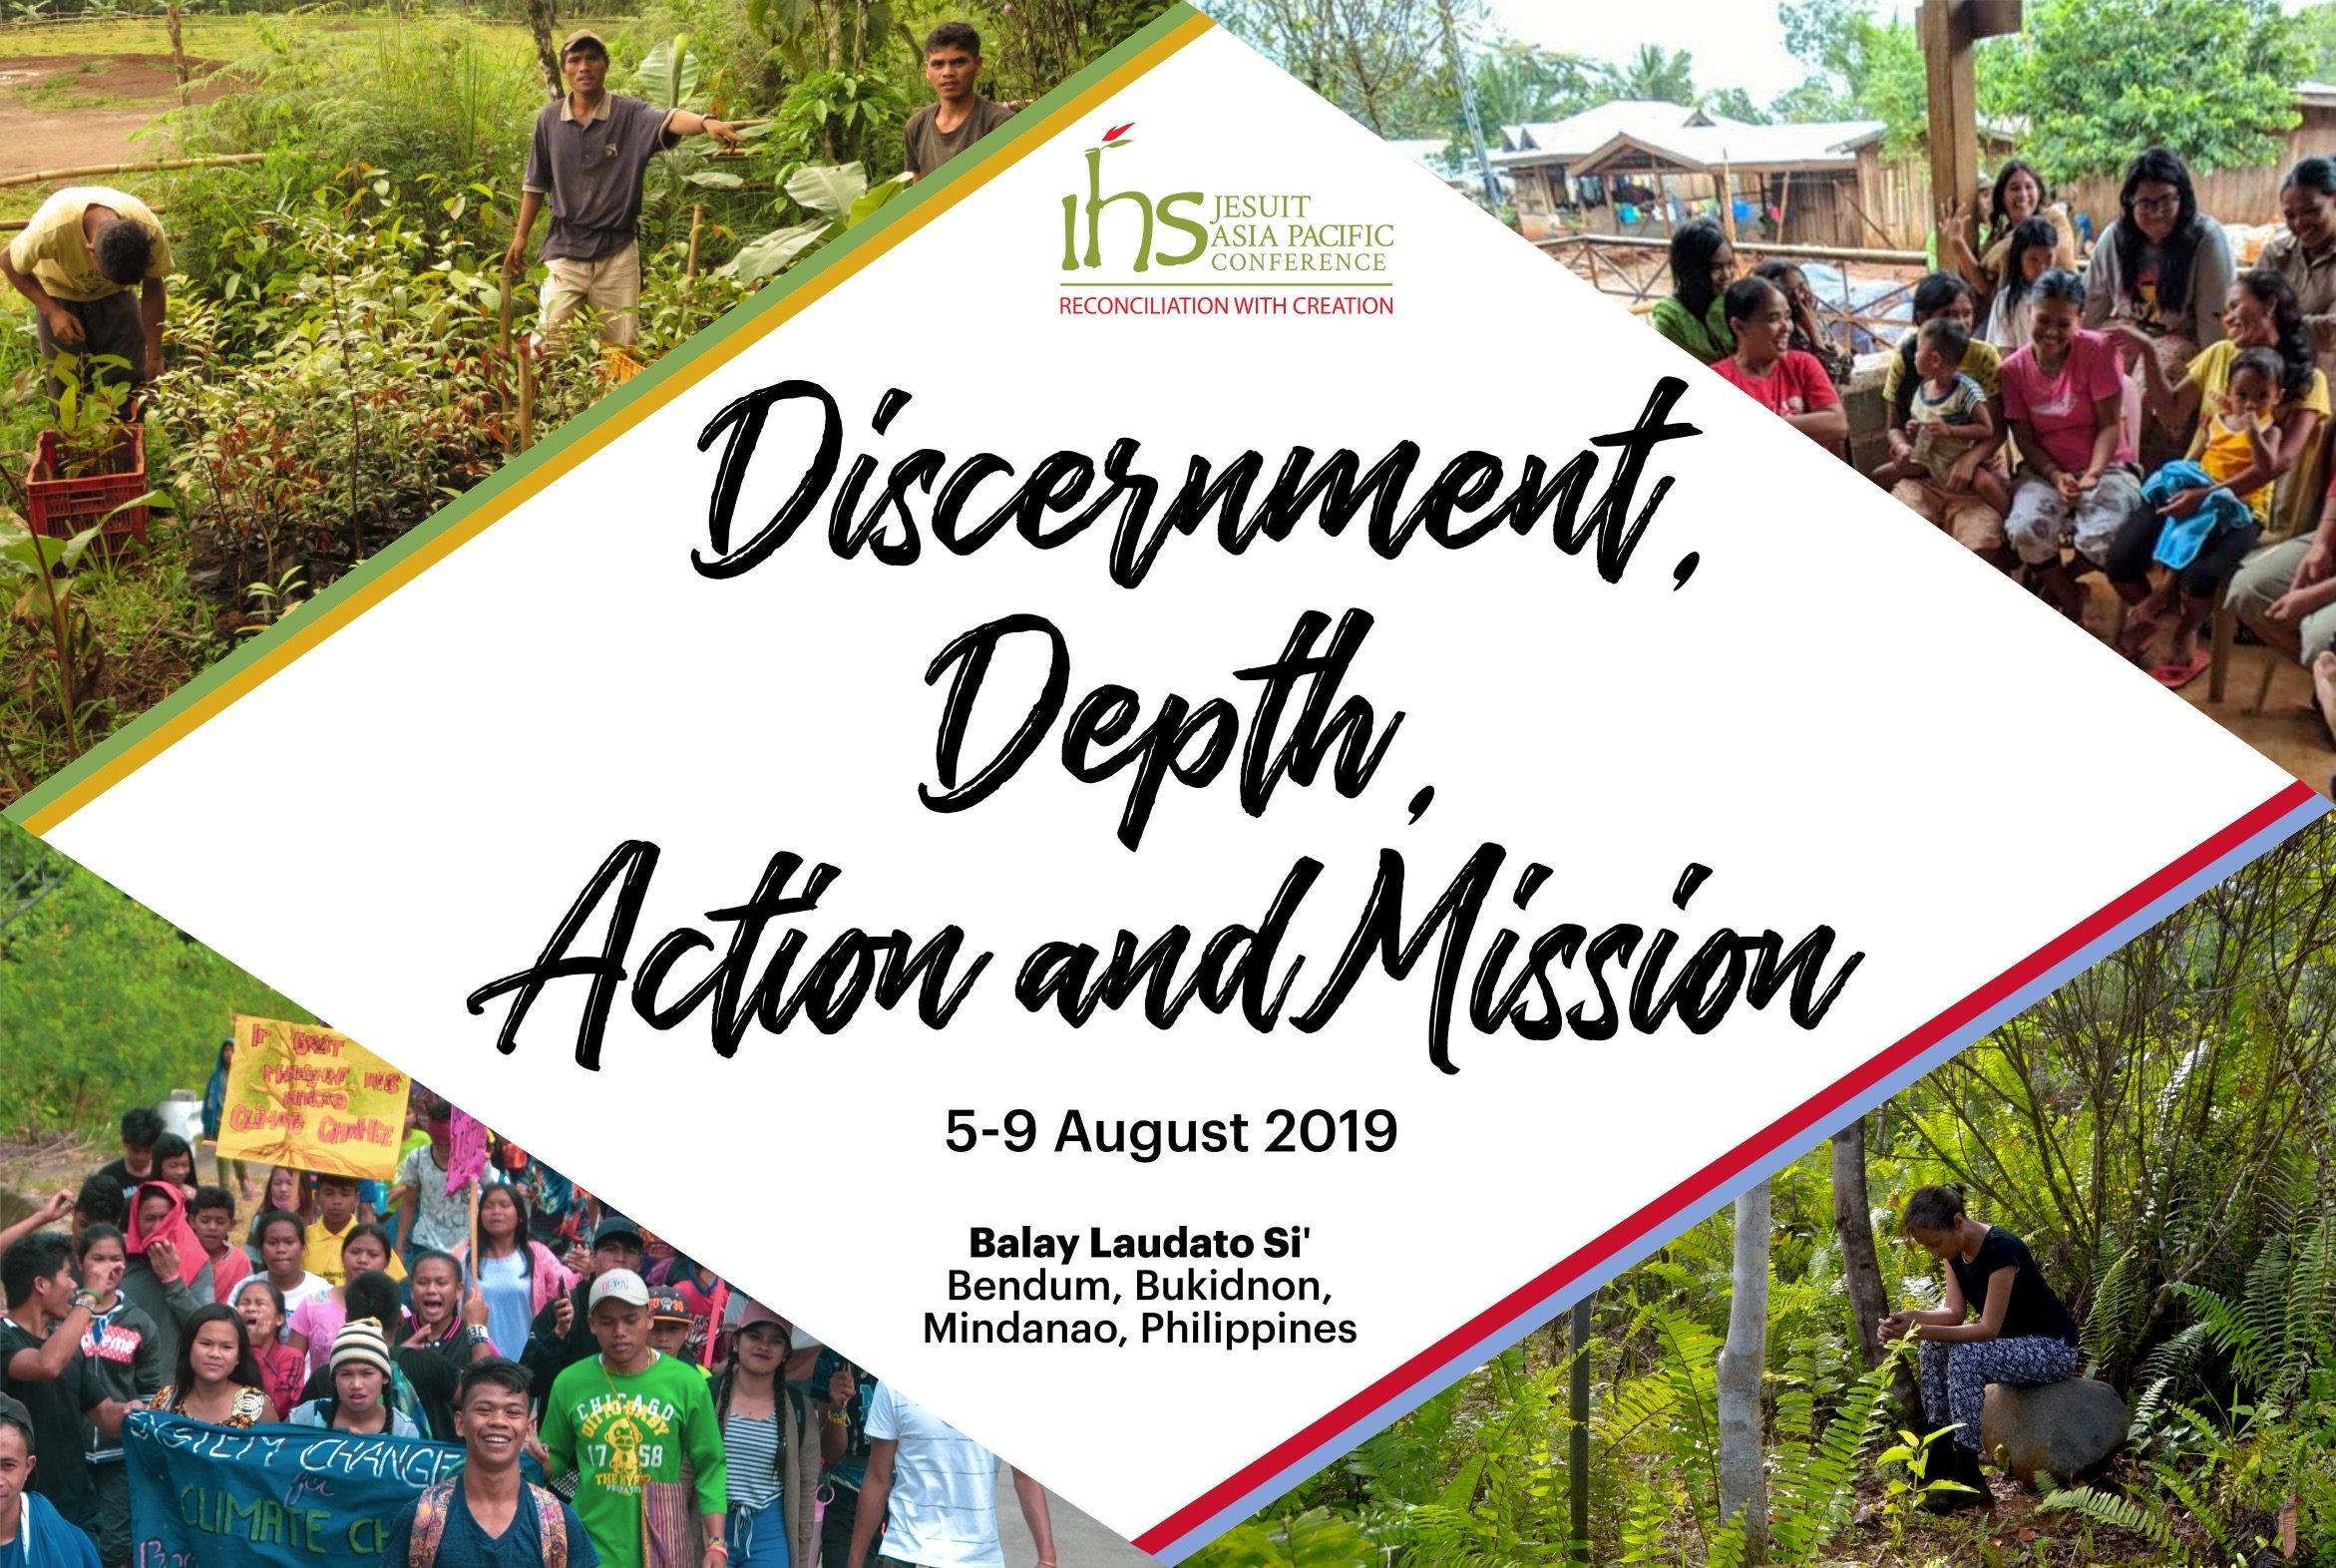 JCAP workshop on discernment, depth, action and mission through the UAPs